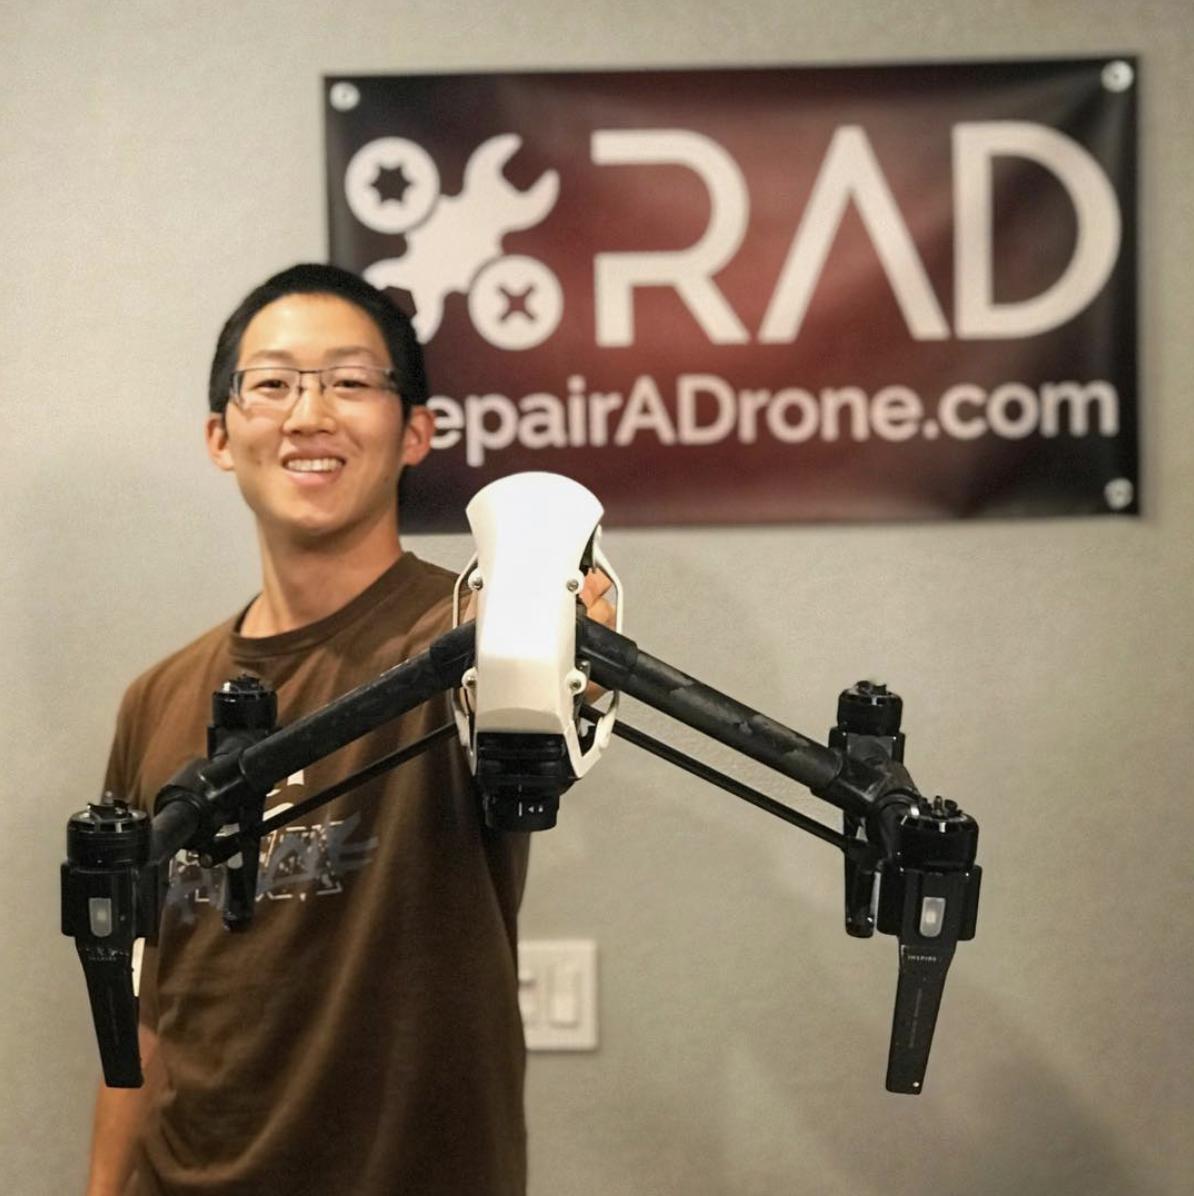 Han Tse, Owner of RepairADrone.com